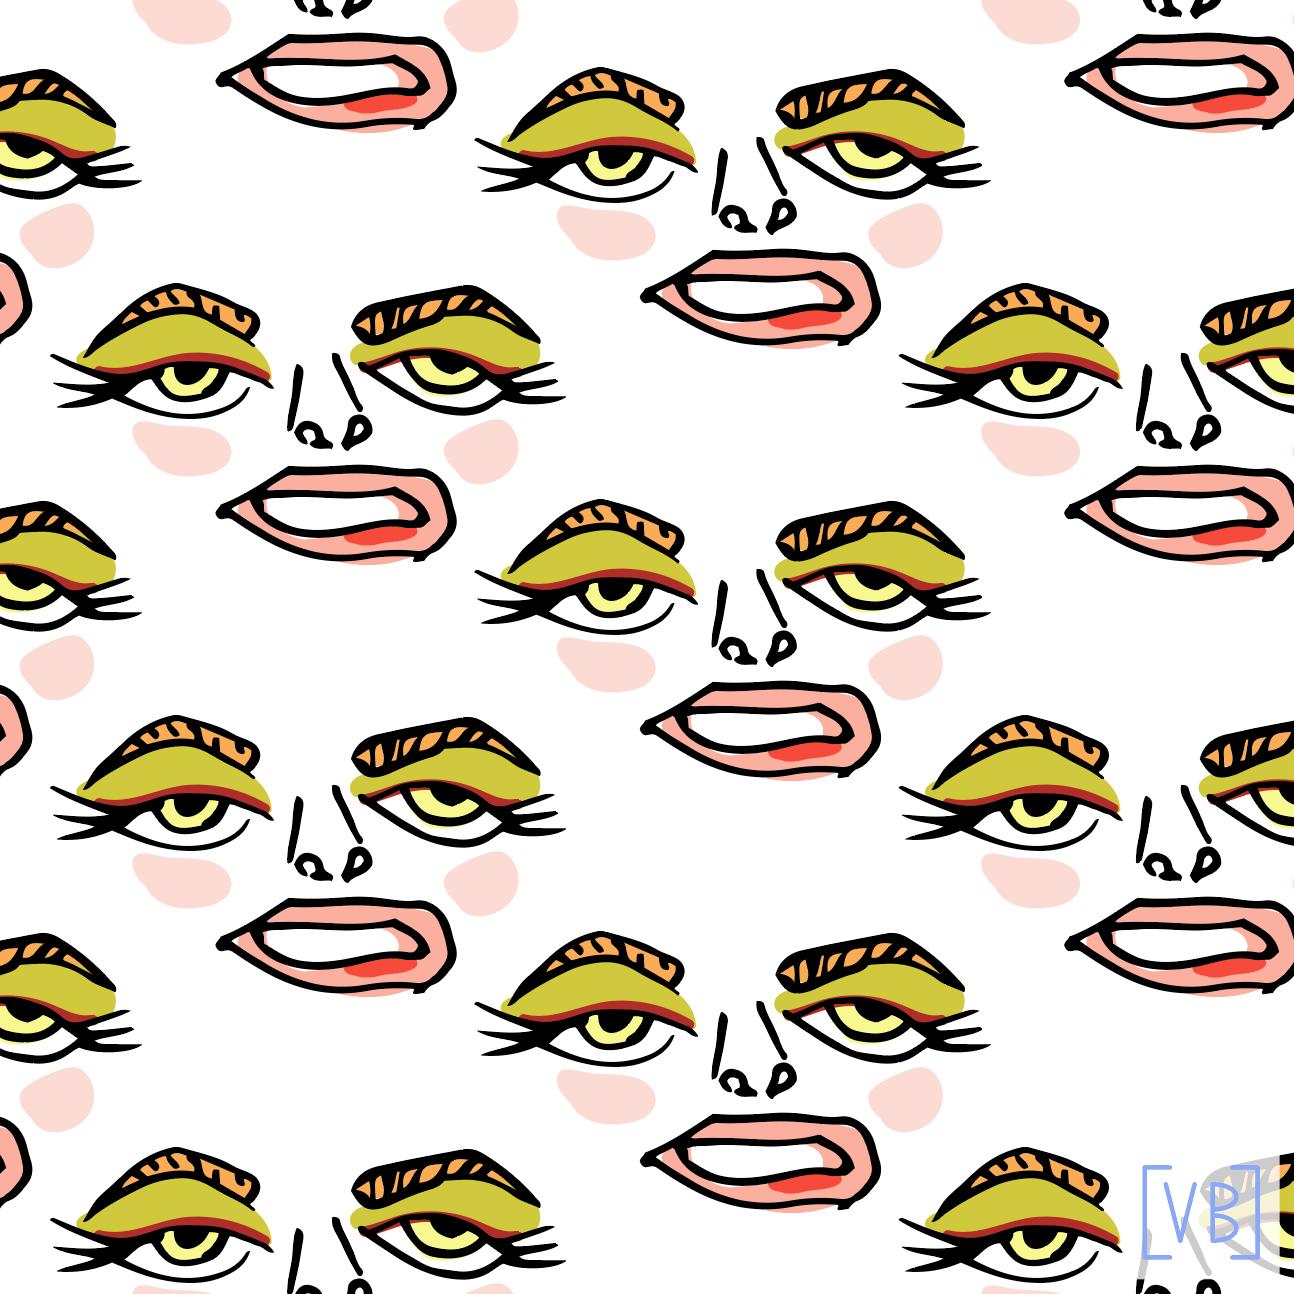 06.29.16_womenfaces.png